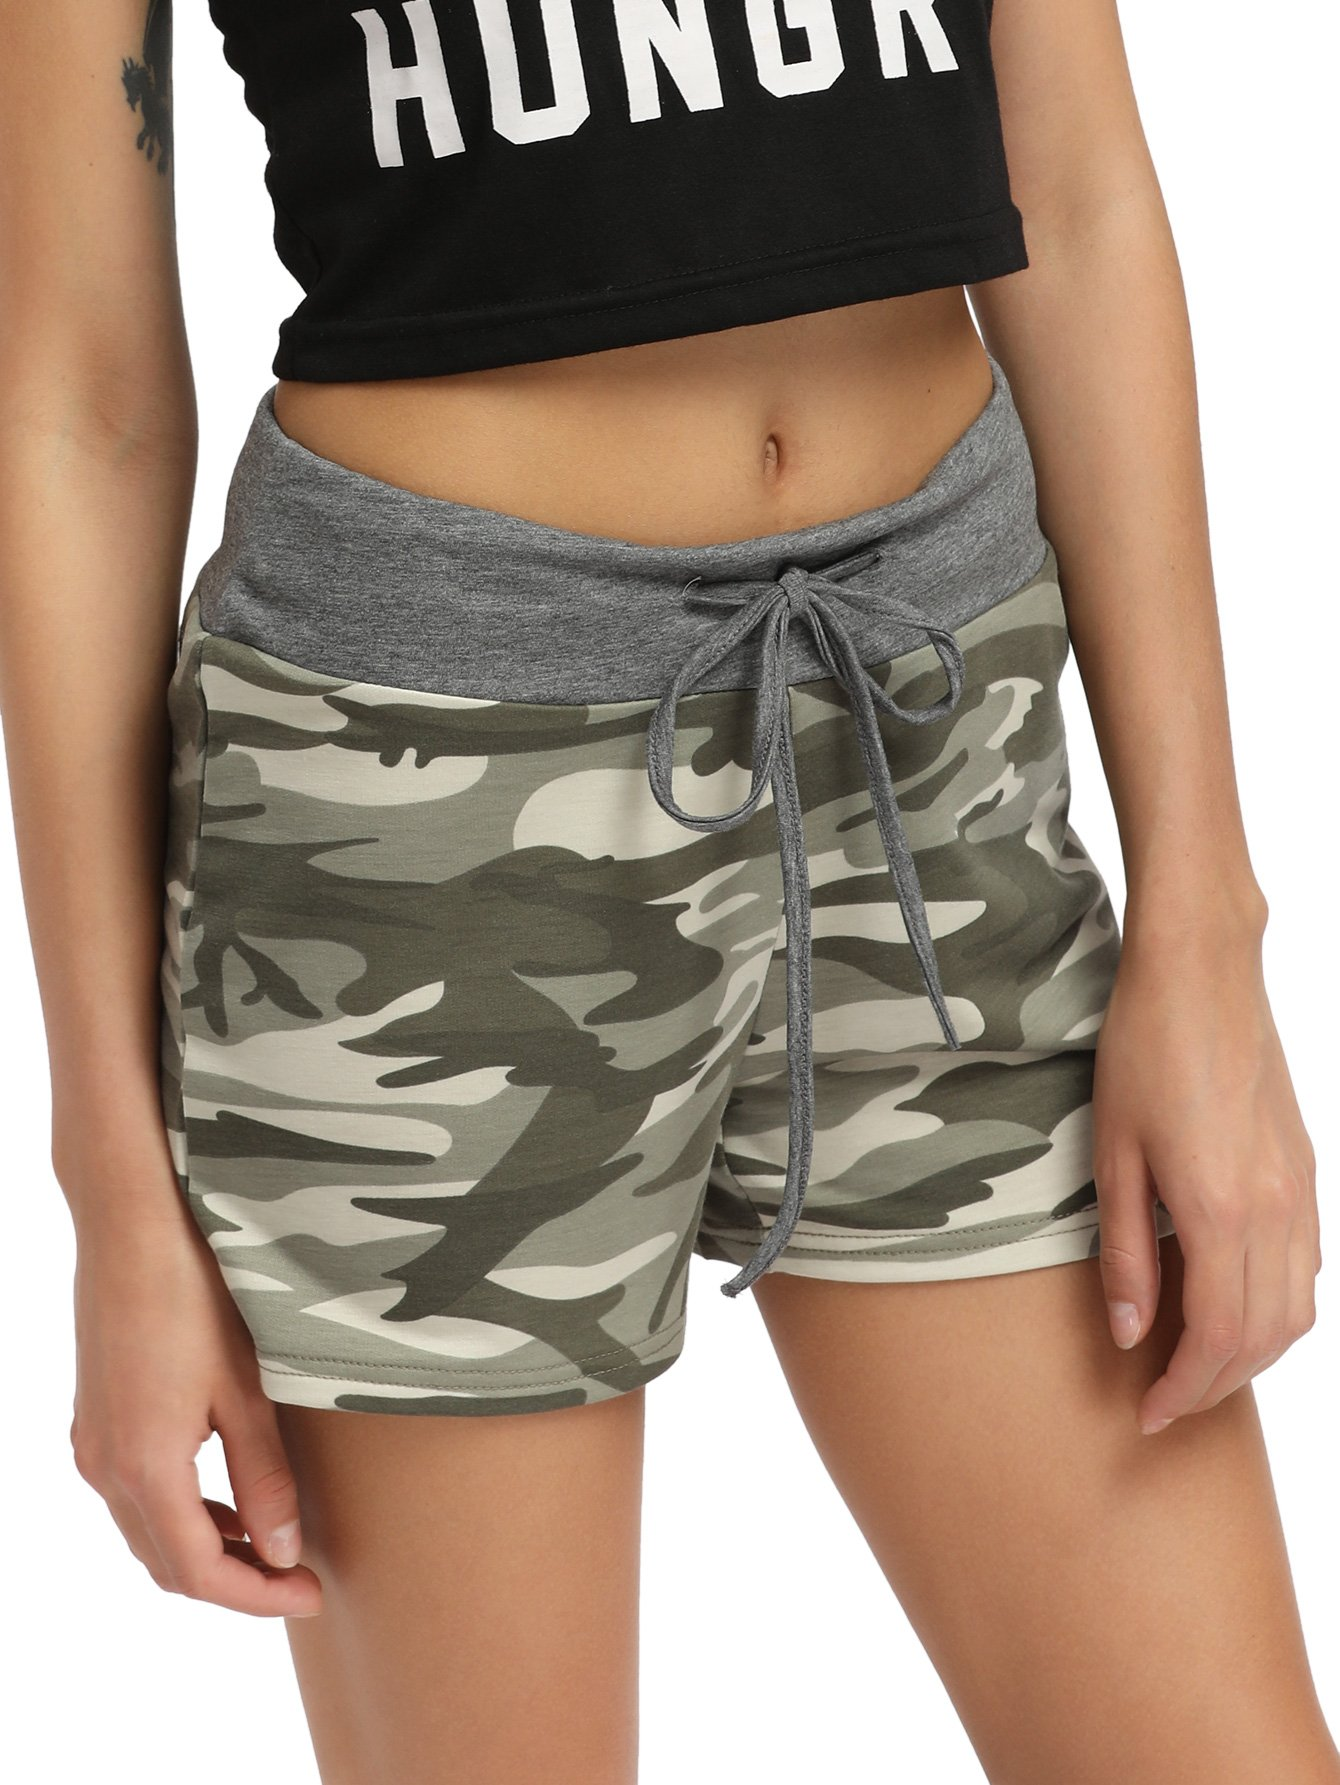 SweatyRocks Workout Yoga Shorts Pants Hot Shorts for Women